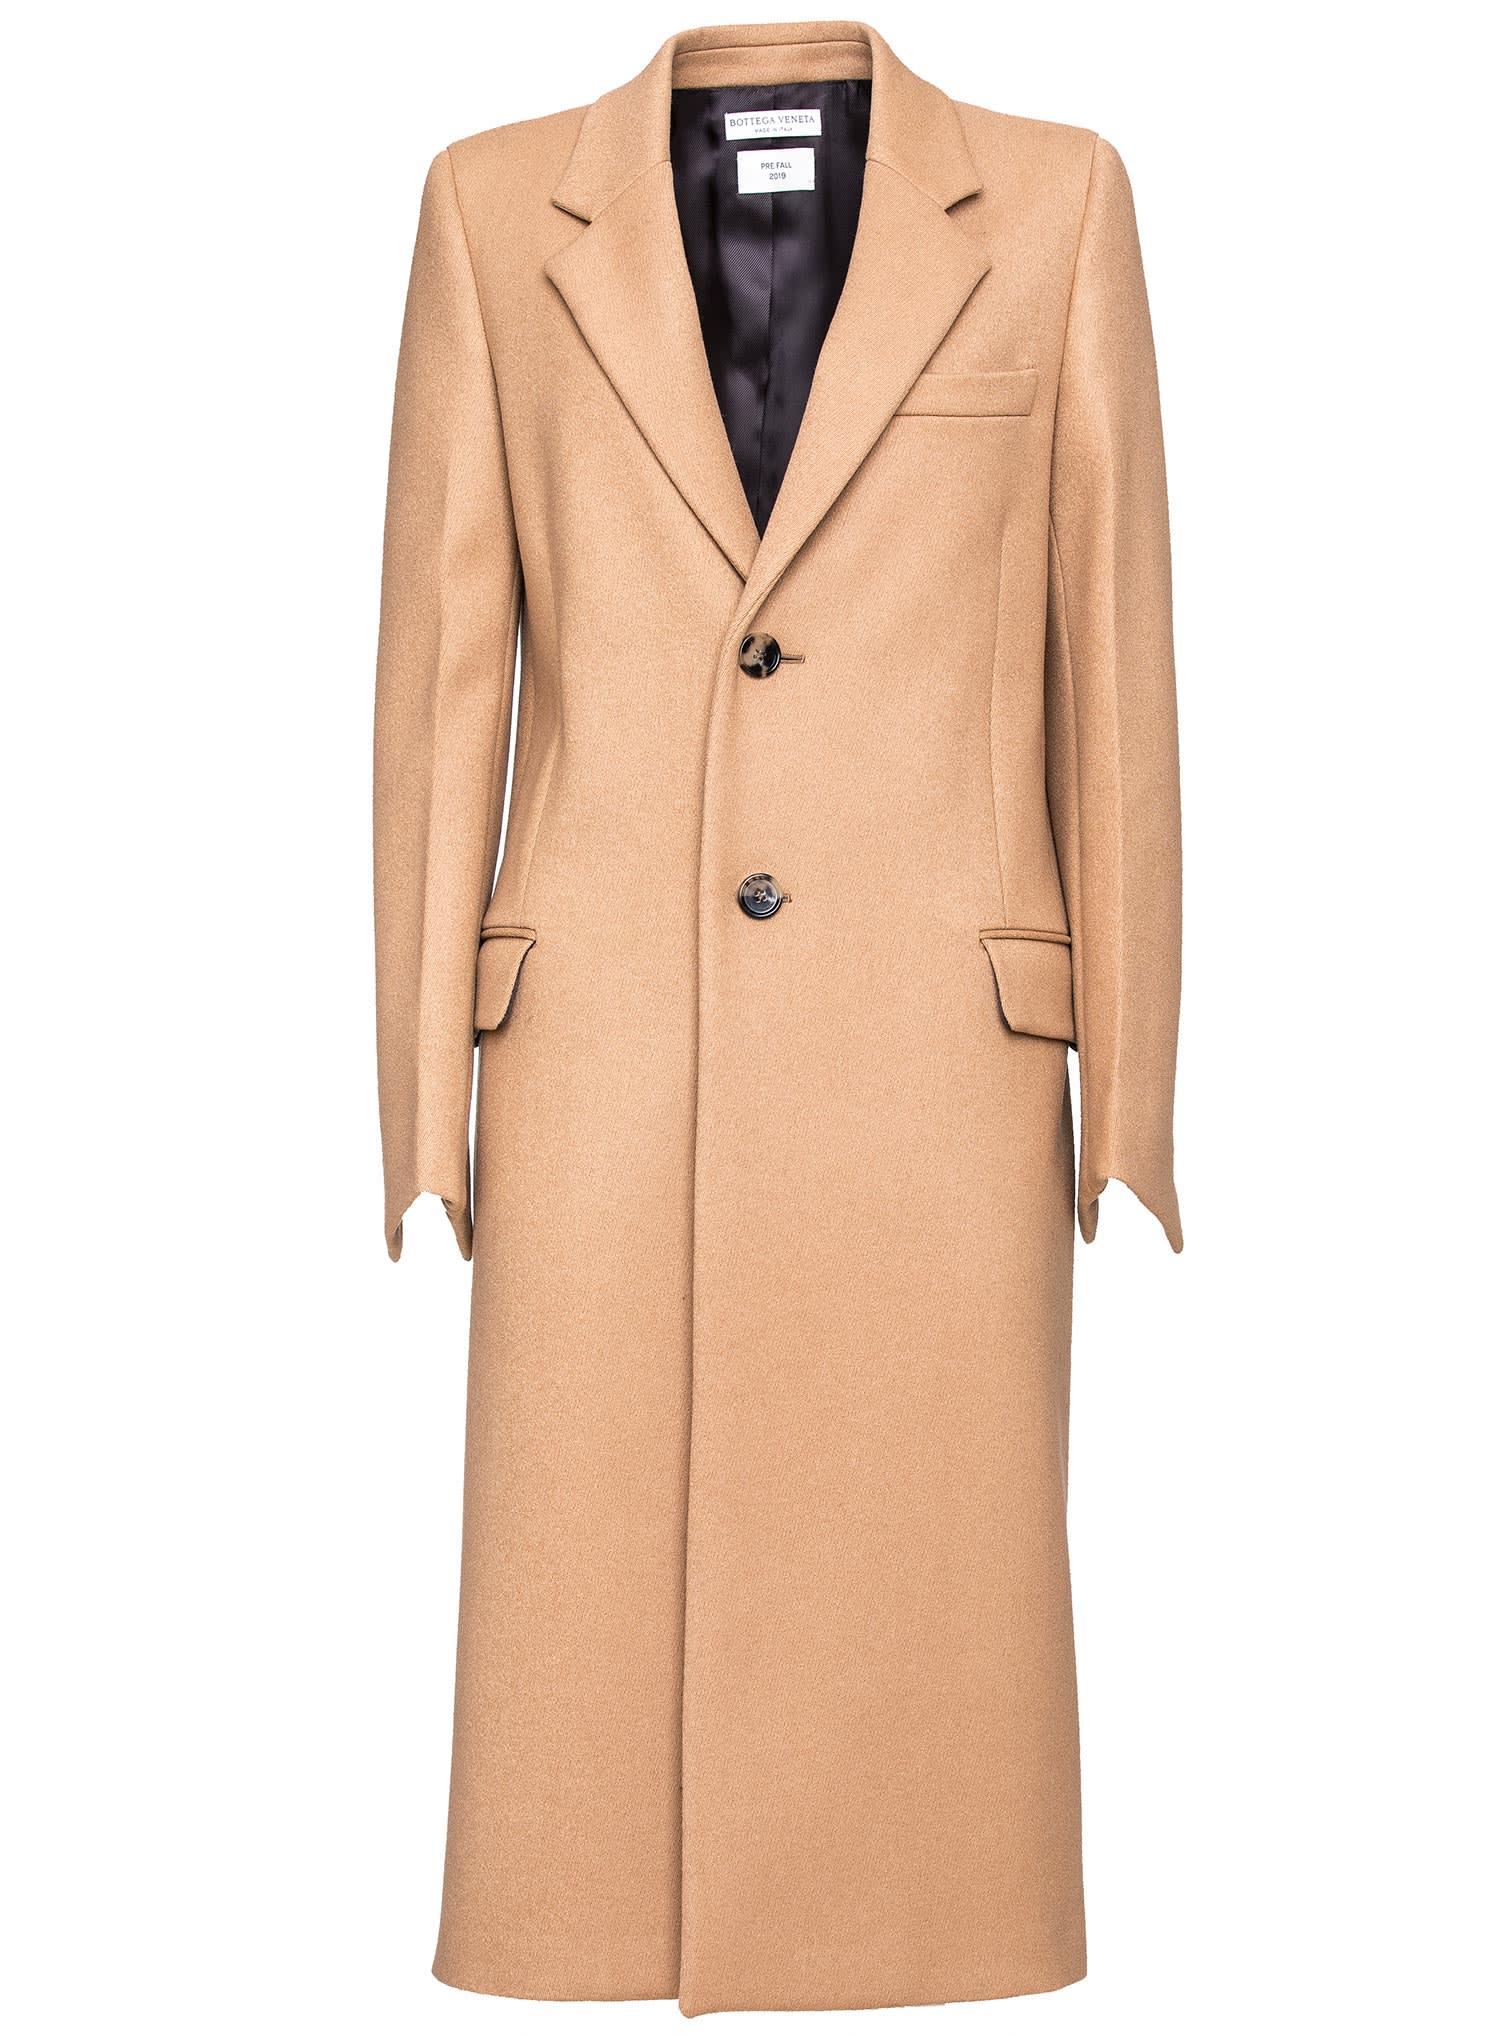 Bottega Veneta Single-breasted Coat